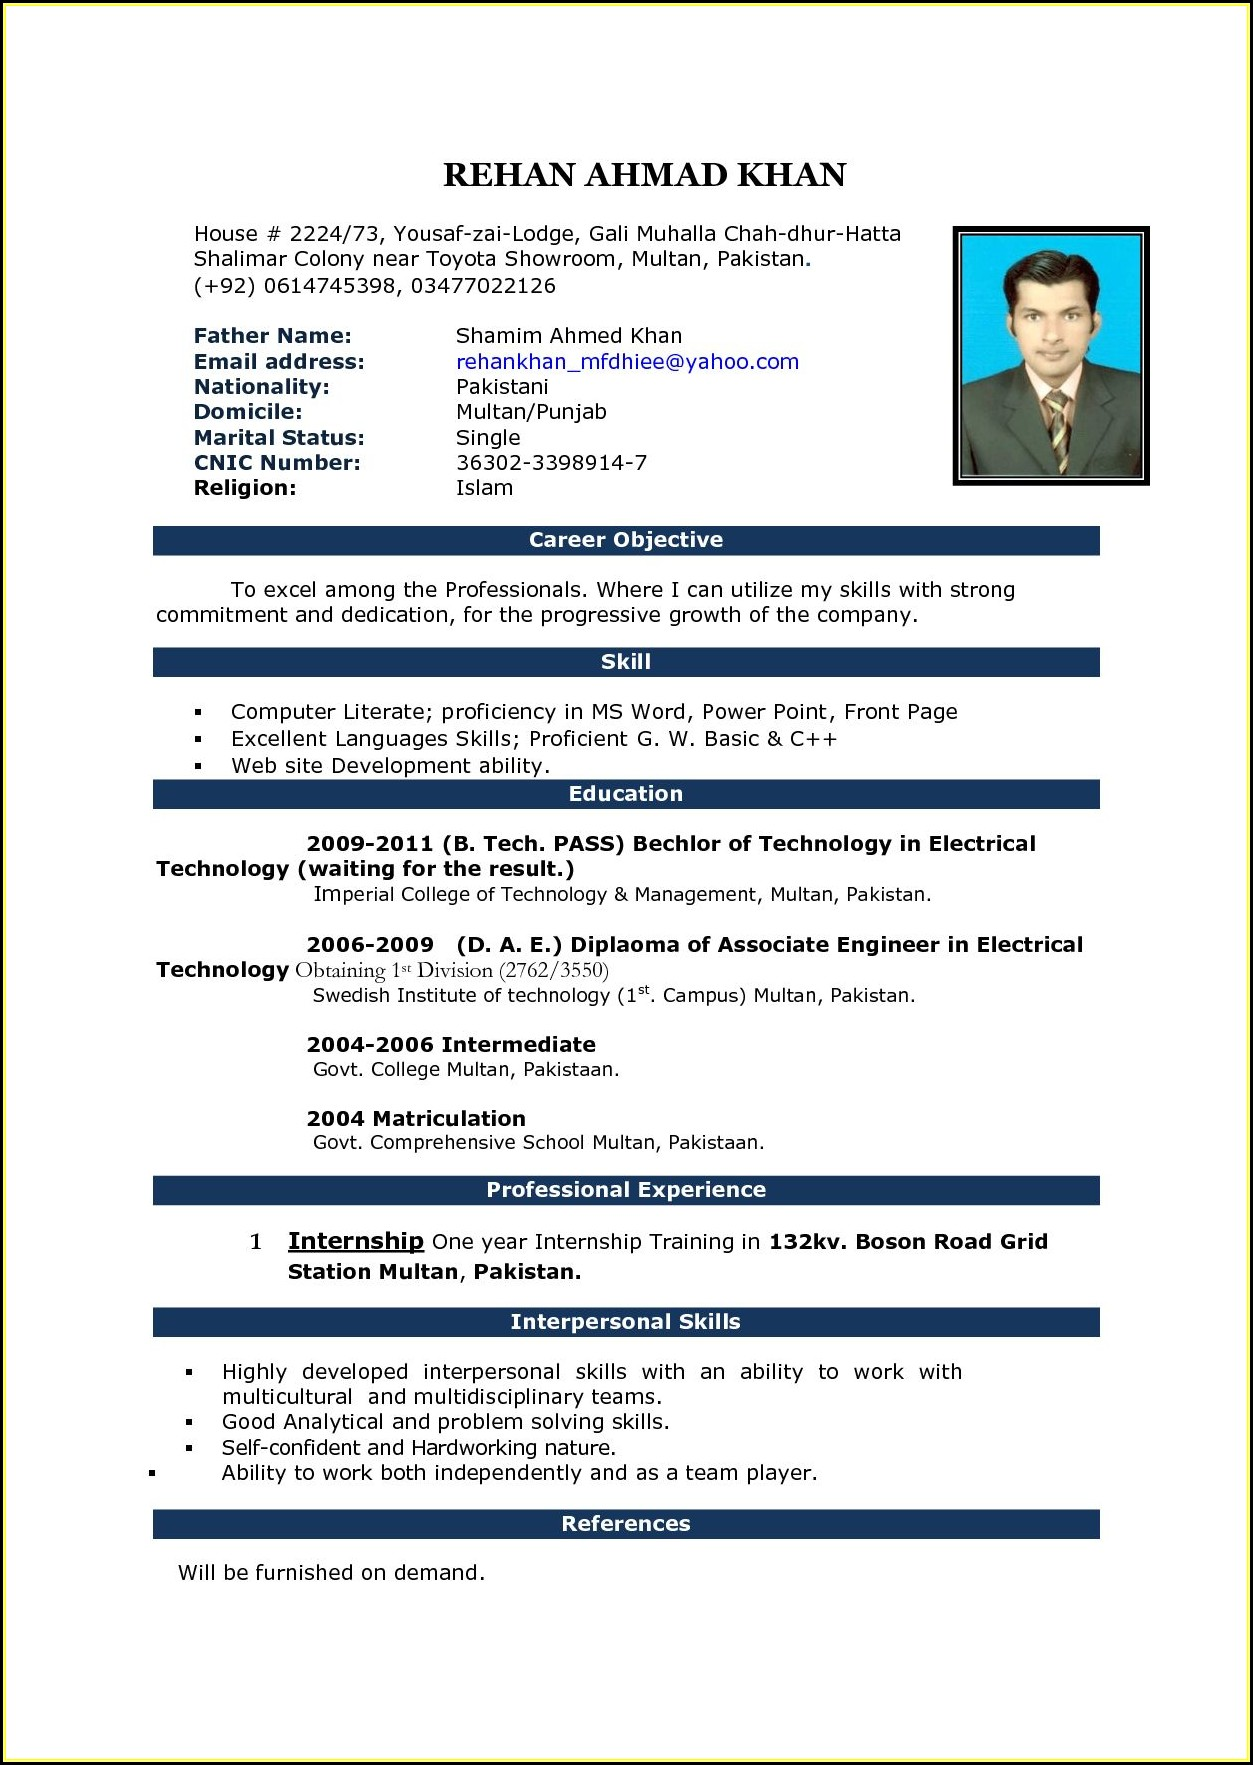 Resume Templates Microsoft Word Free Download